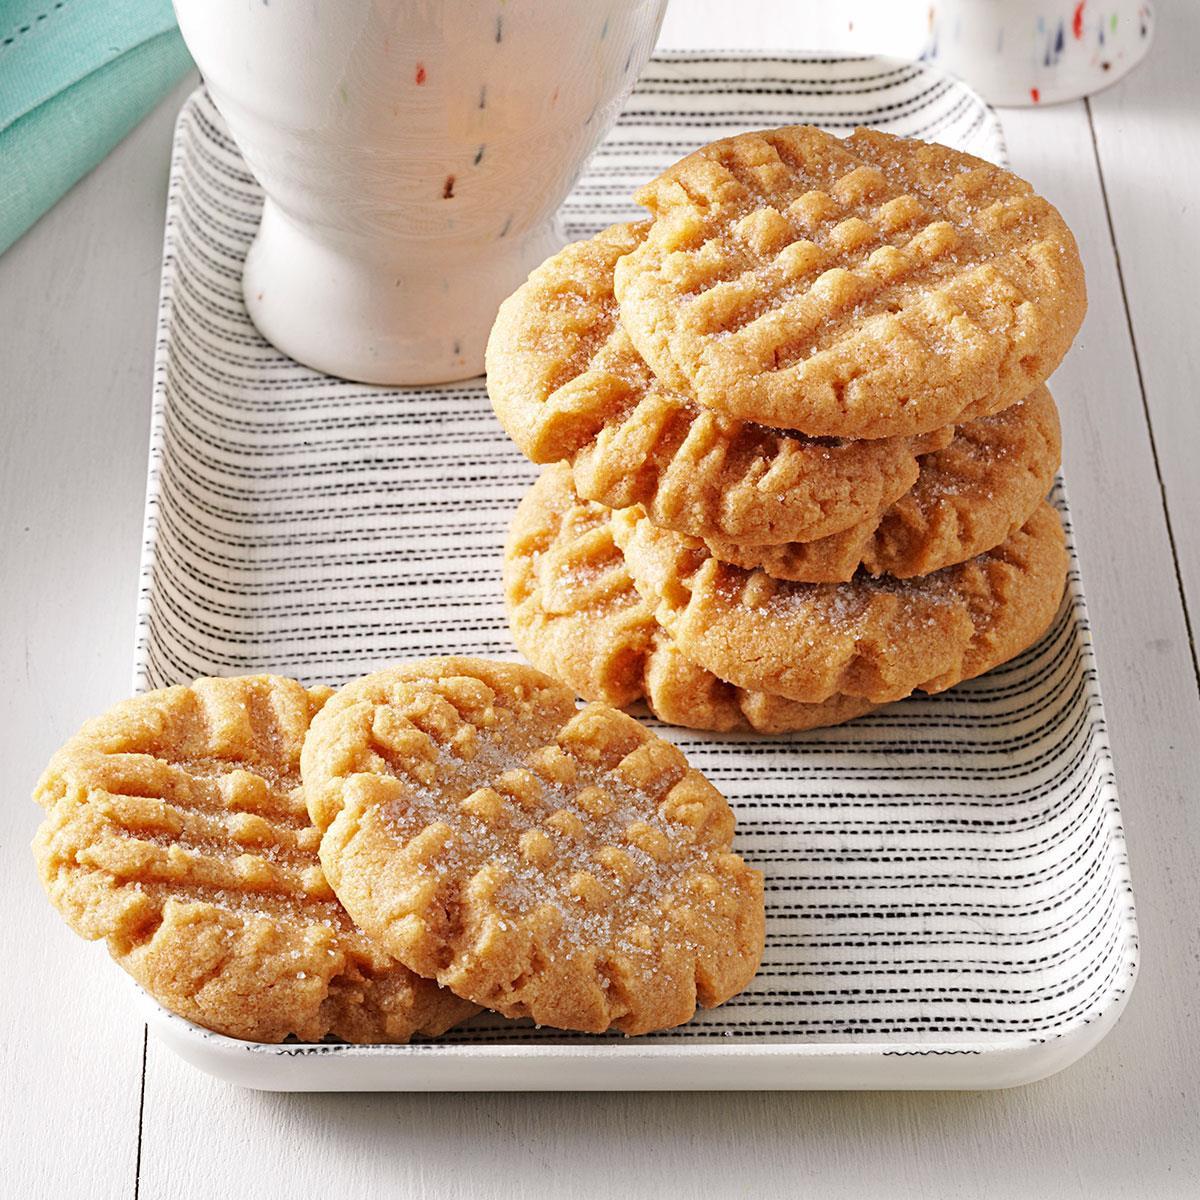 Peanut Butter Cookies Recipes  Peanut Butter Cookies Recipe